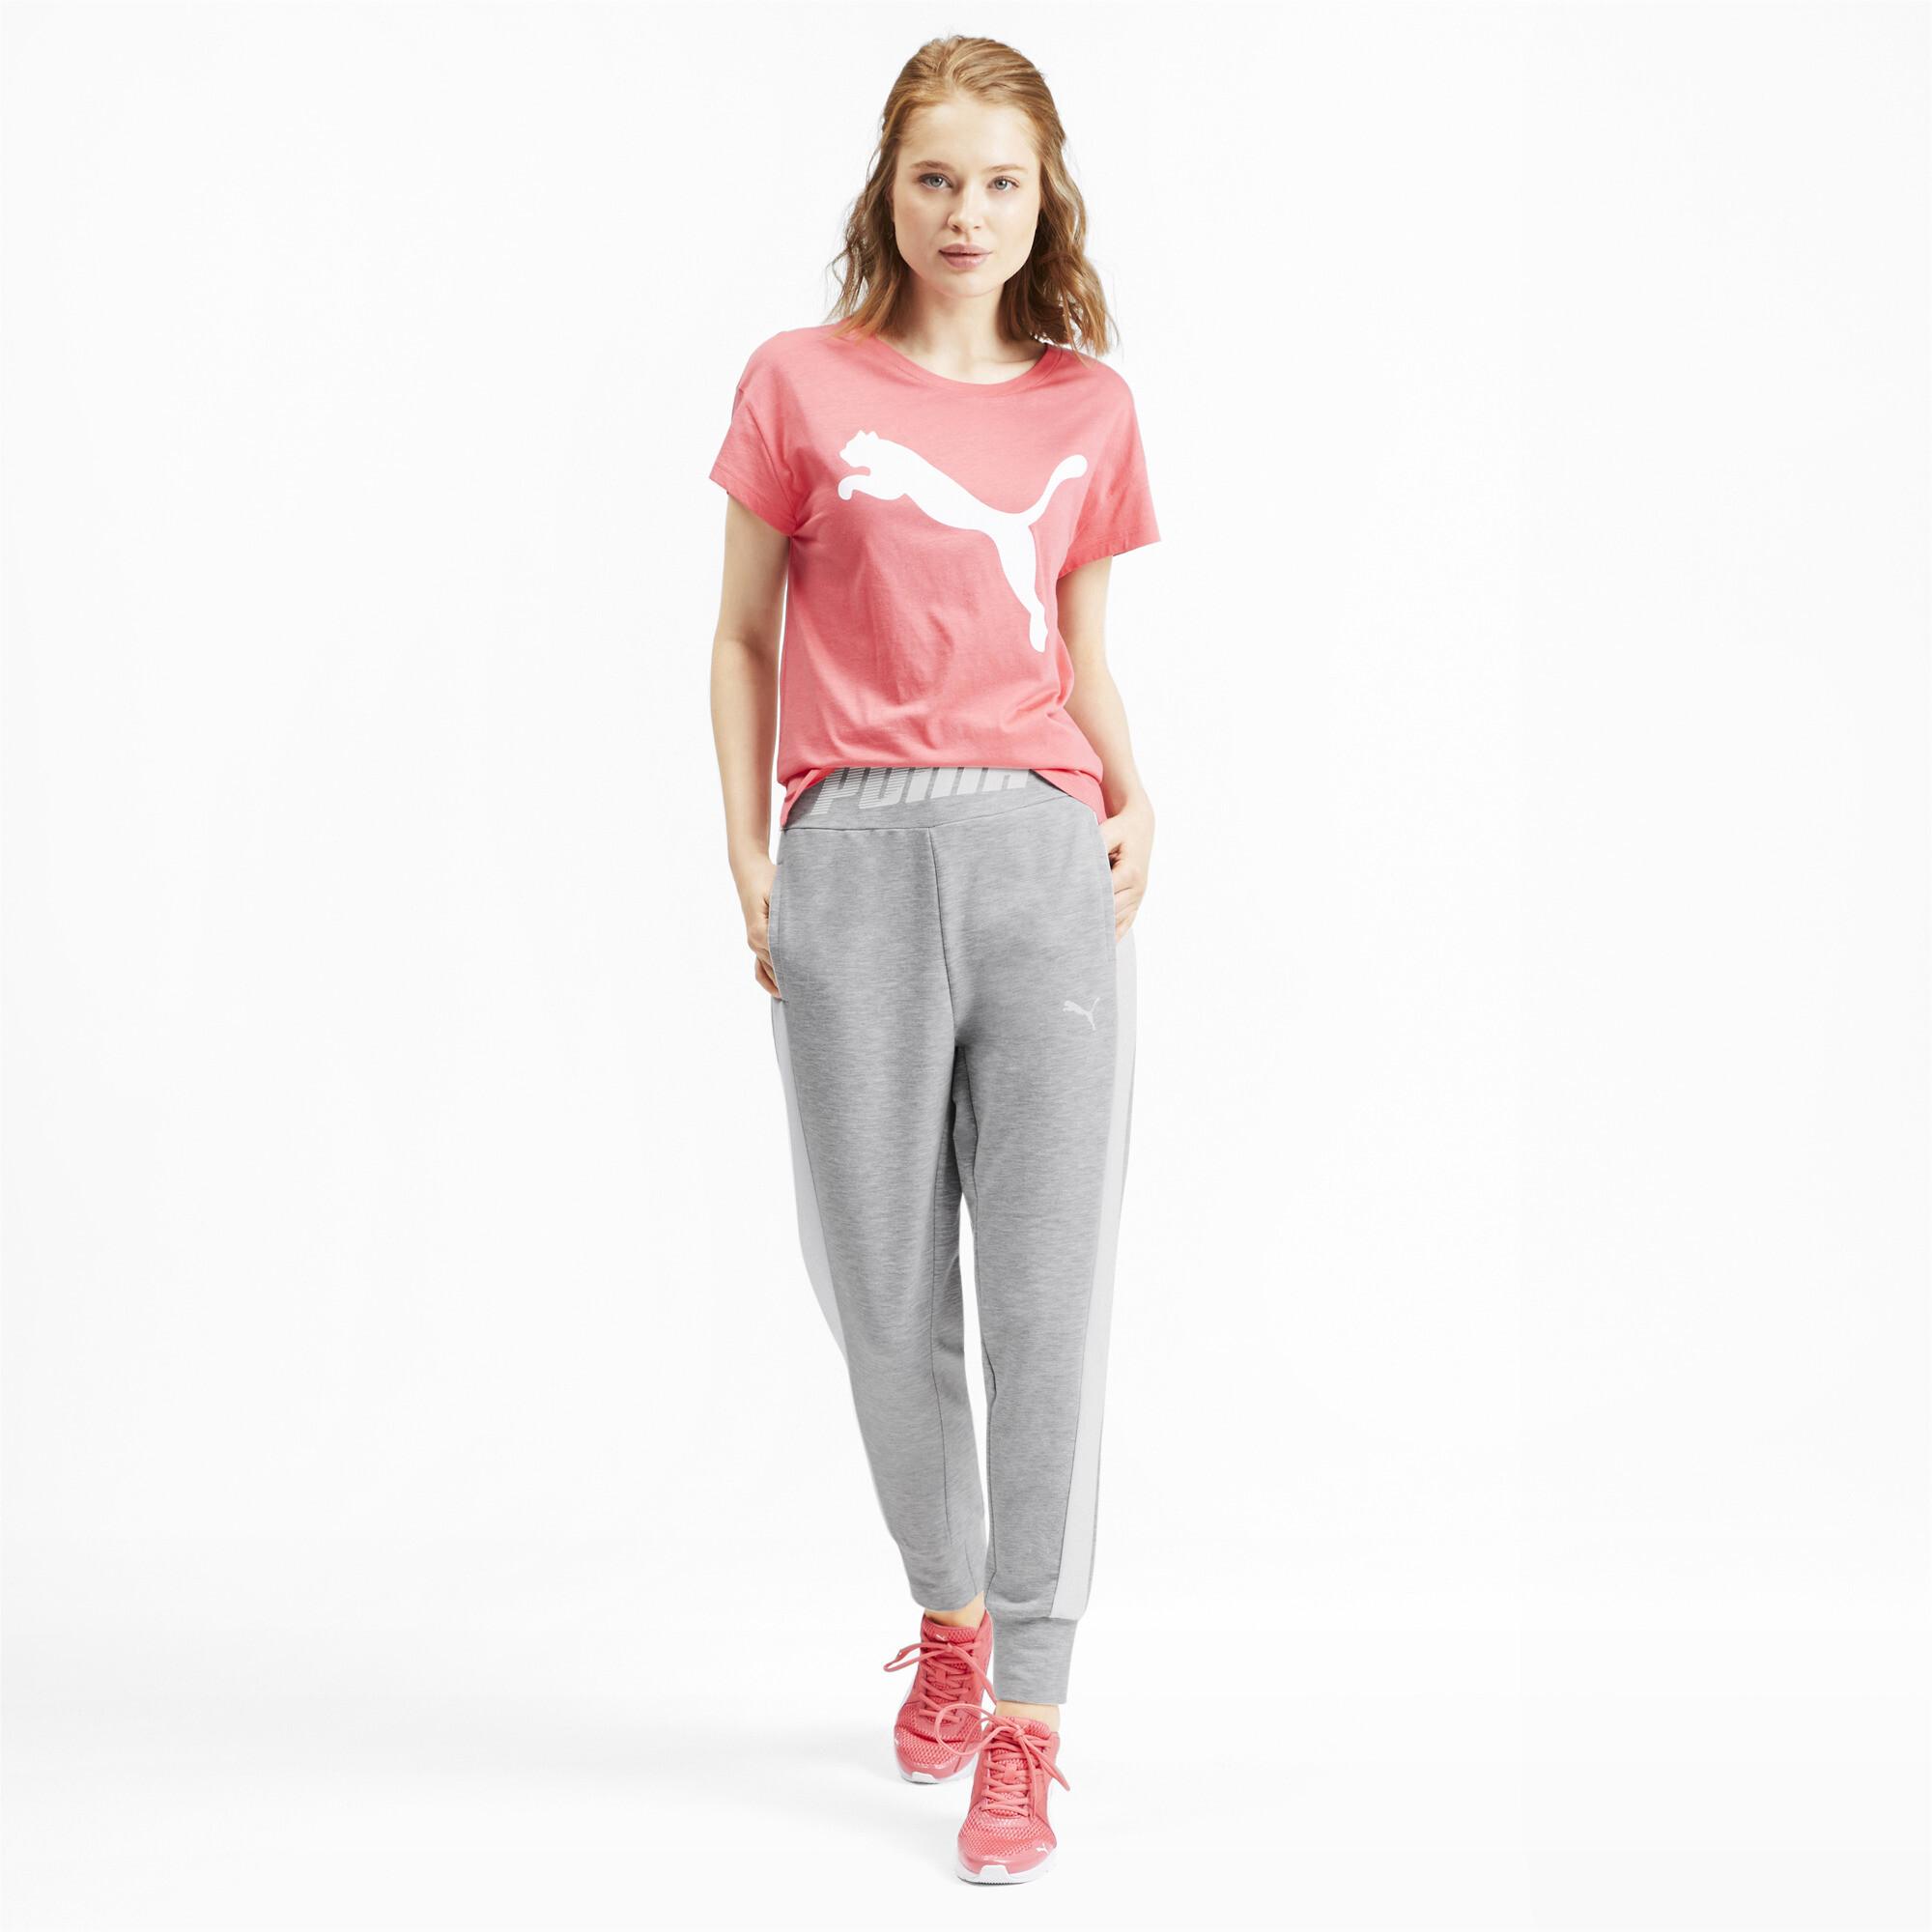 PUMA-Modern-Sports-Women-039-s-Track-Pants-Women-Knitted-Pants-Basics thumbnail 11